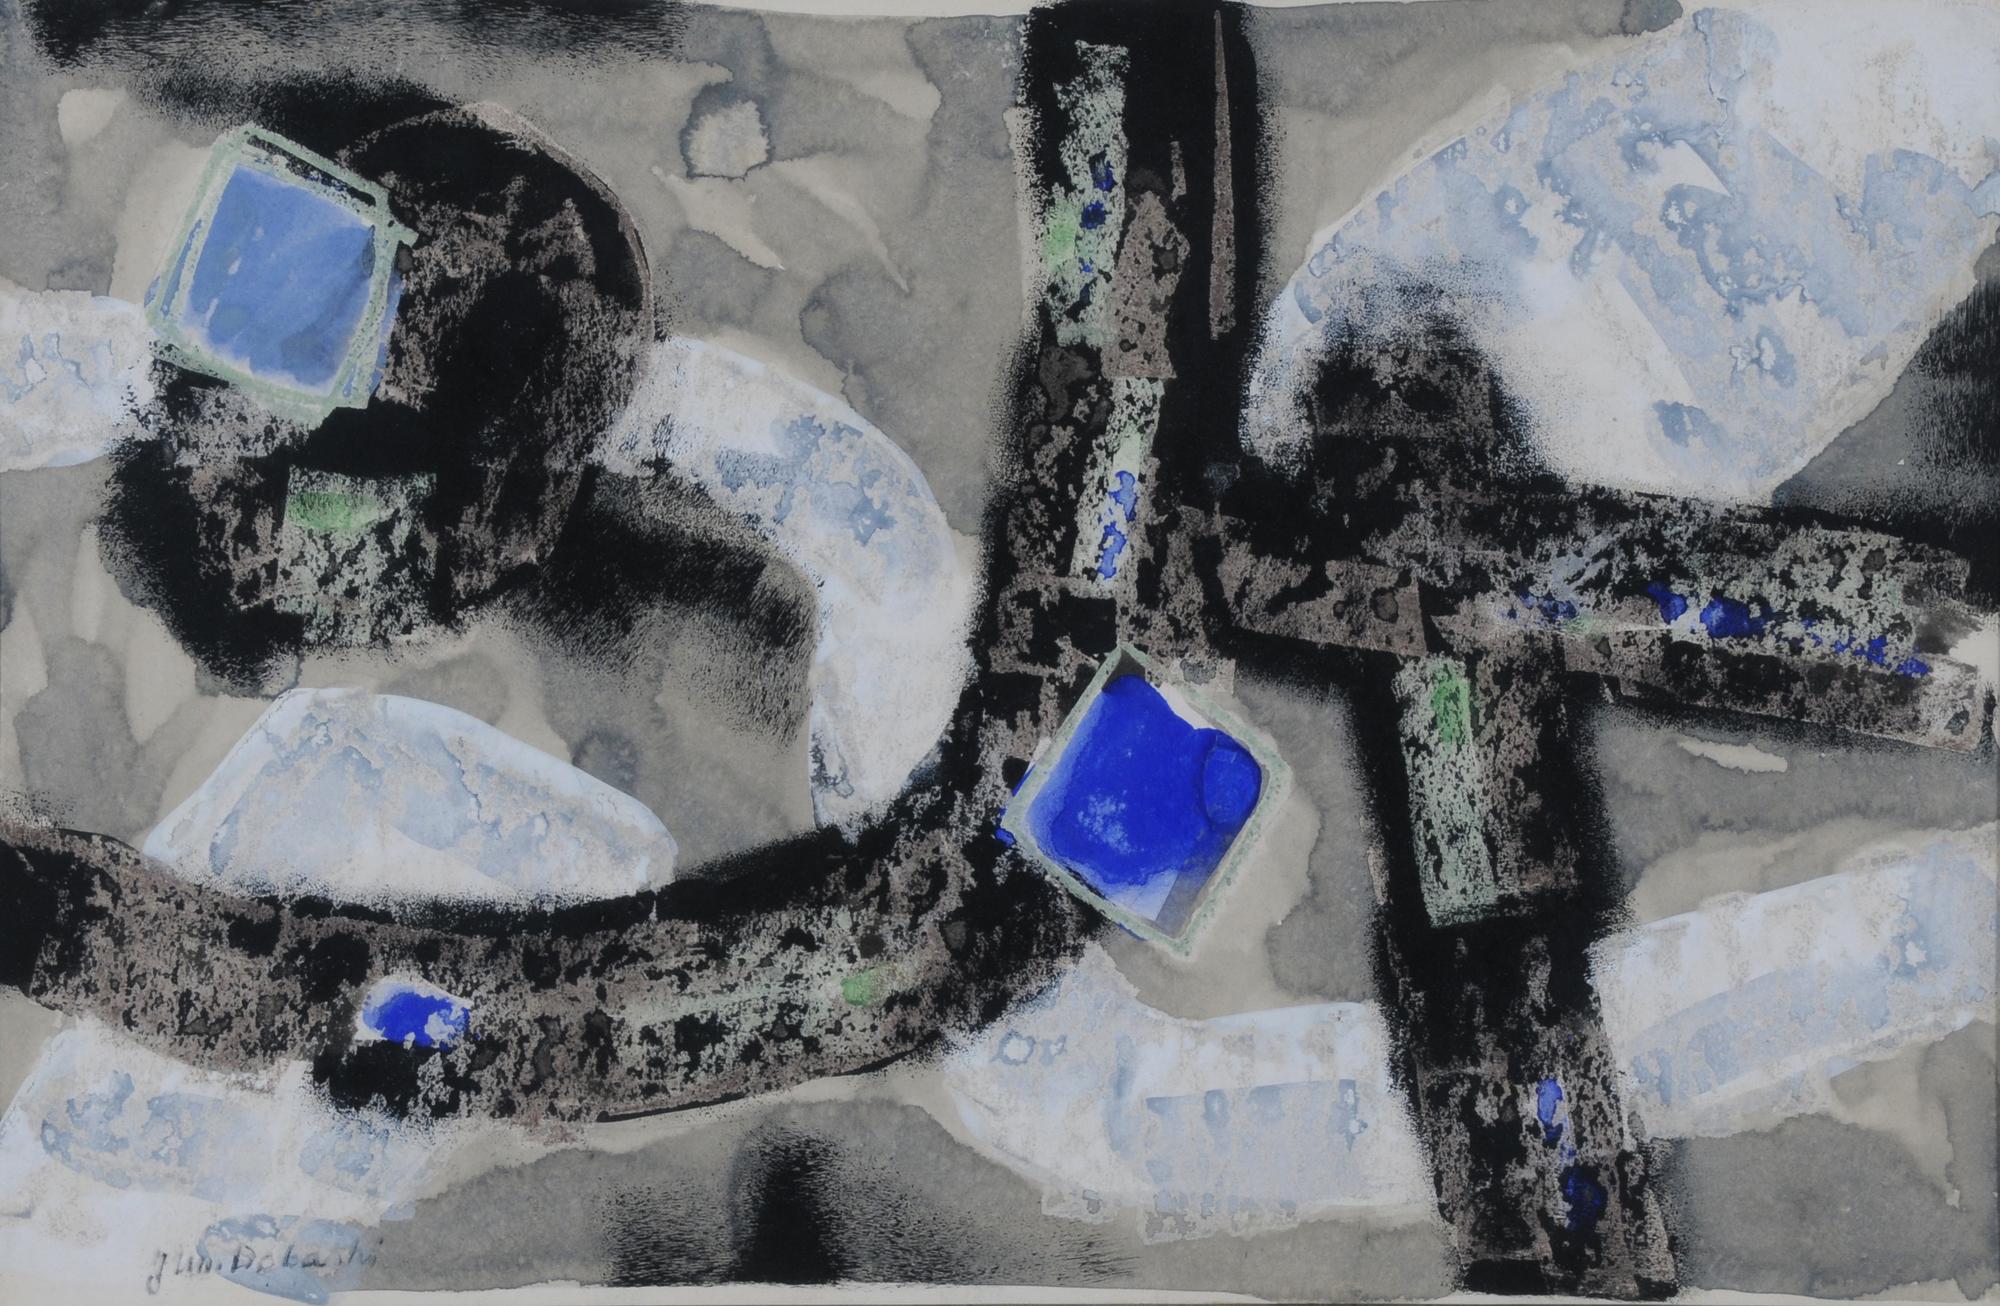 Dobashi Jun, Composition